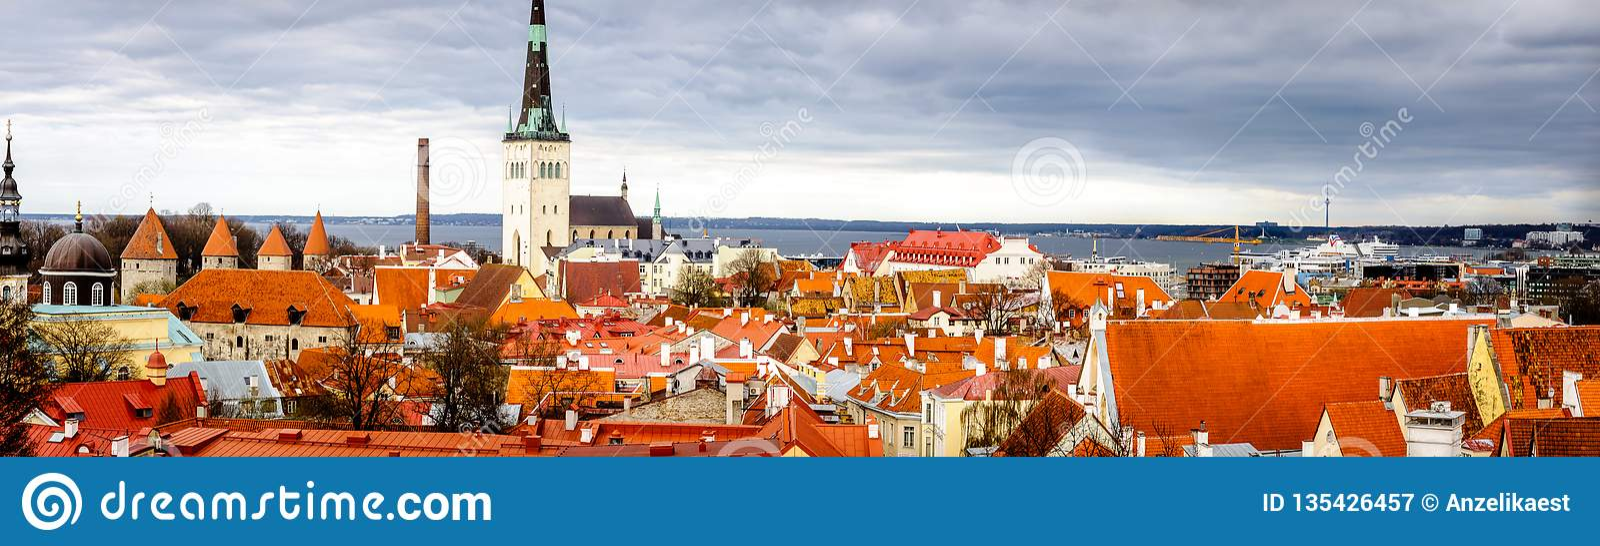 Panorama de Estonia, Tallinn